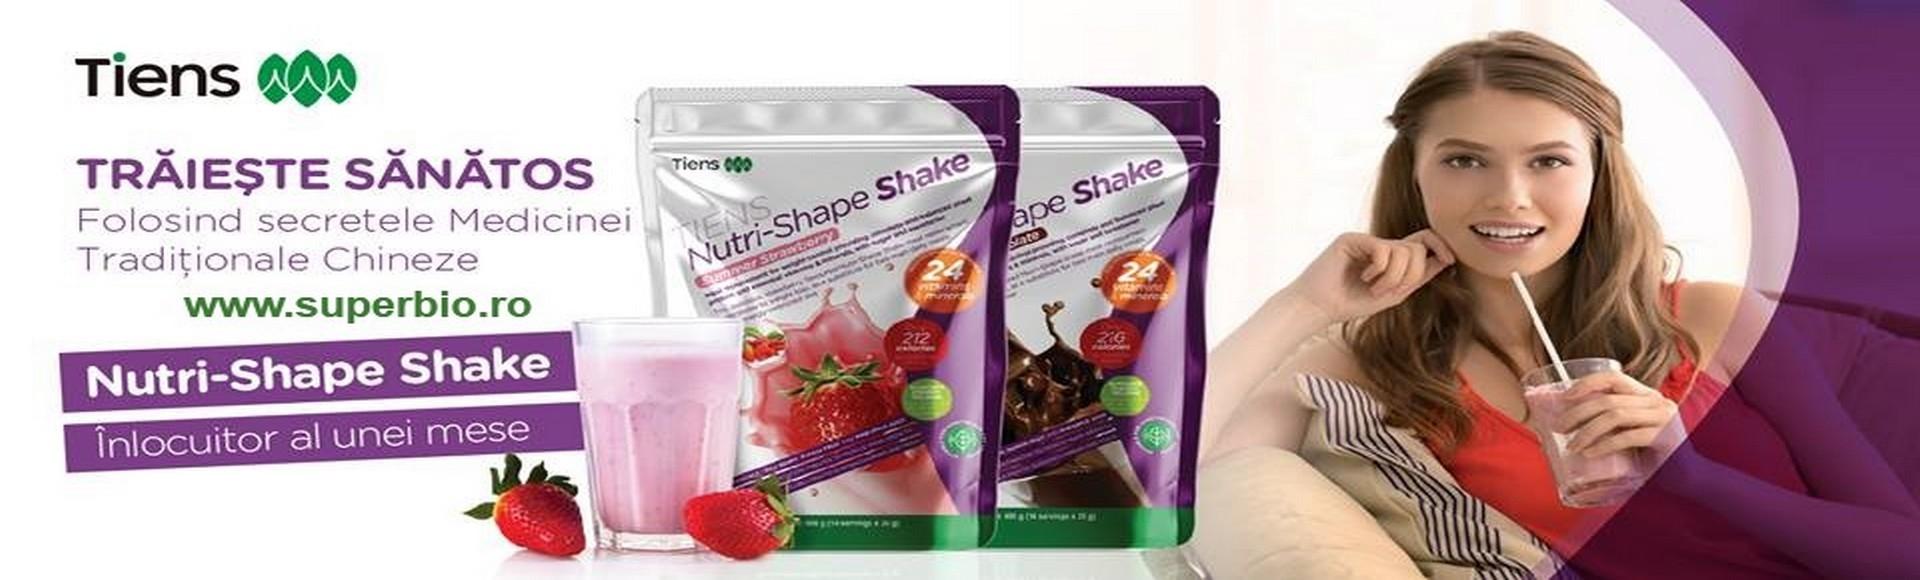 Traieste Sanatos - Nutri-Shape Shake